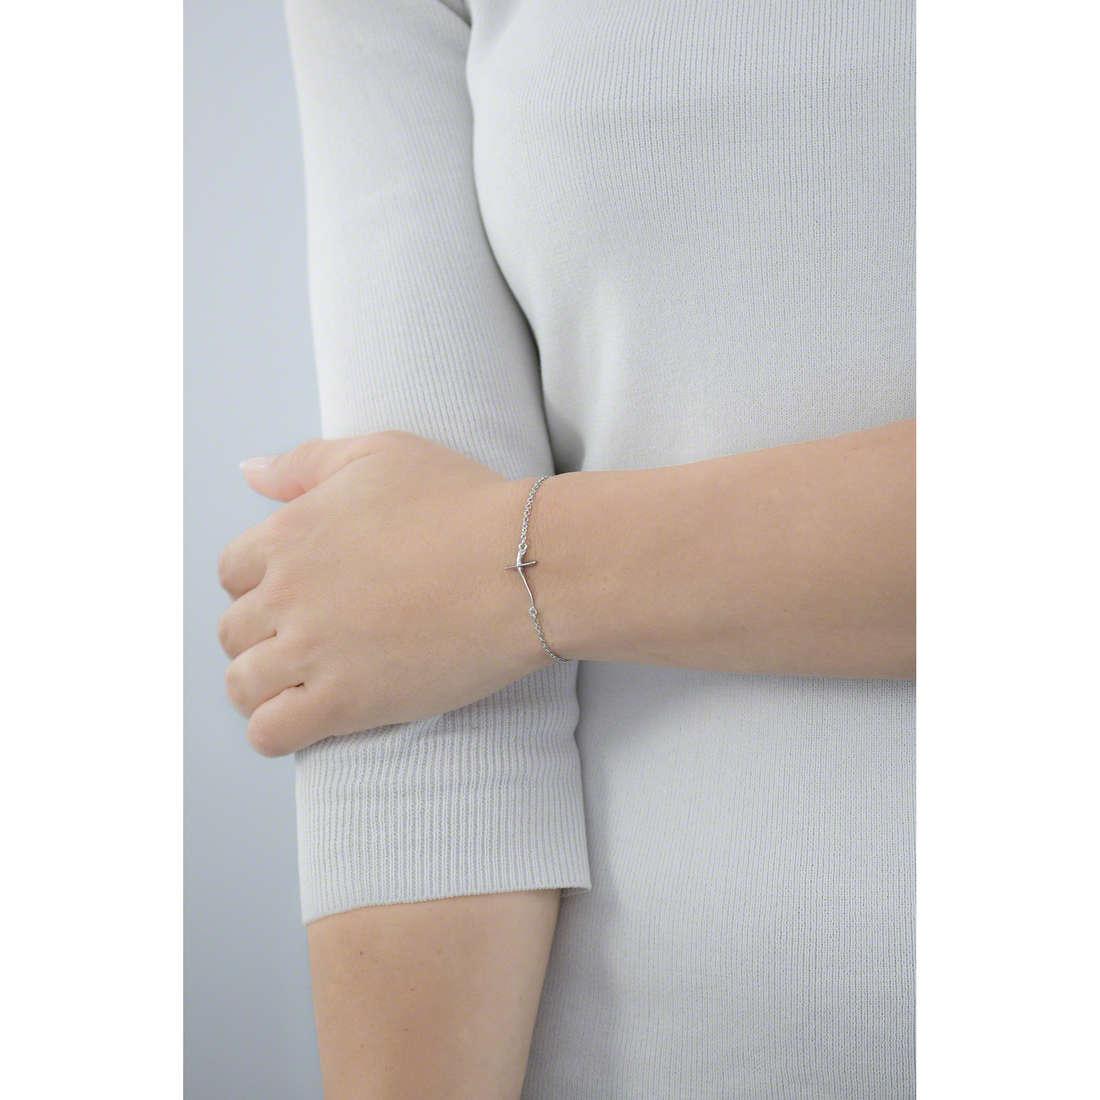 Breil bracelets Small Stories femme TJ1786 indosso